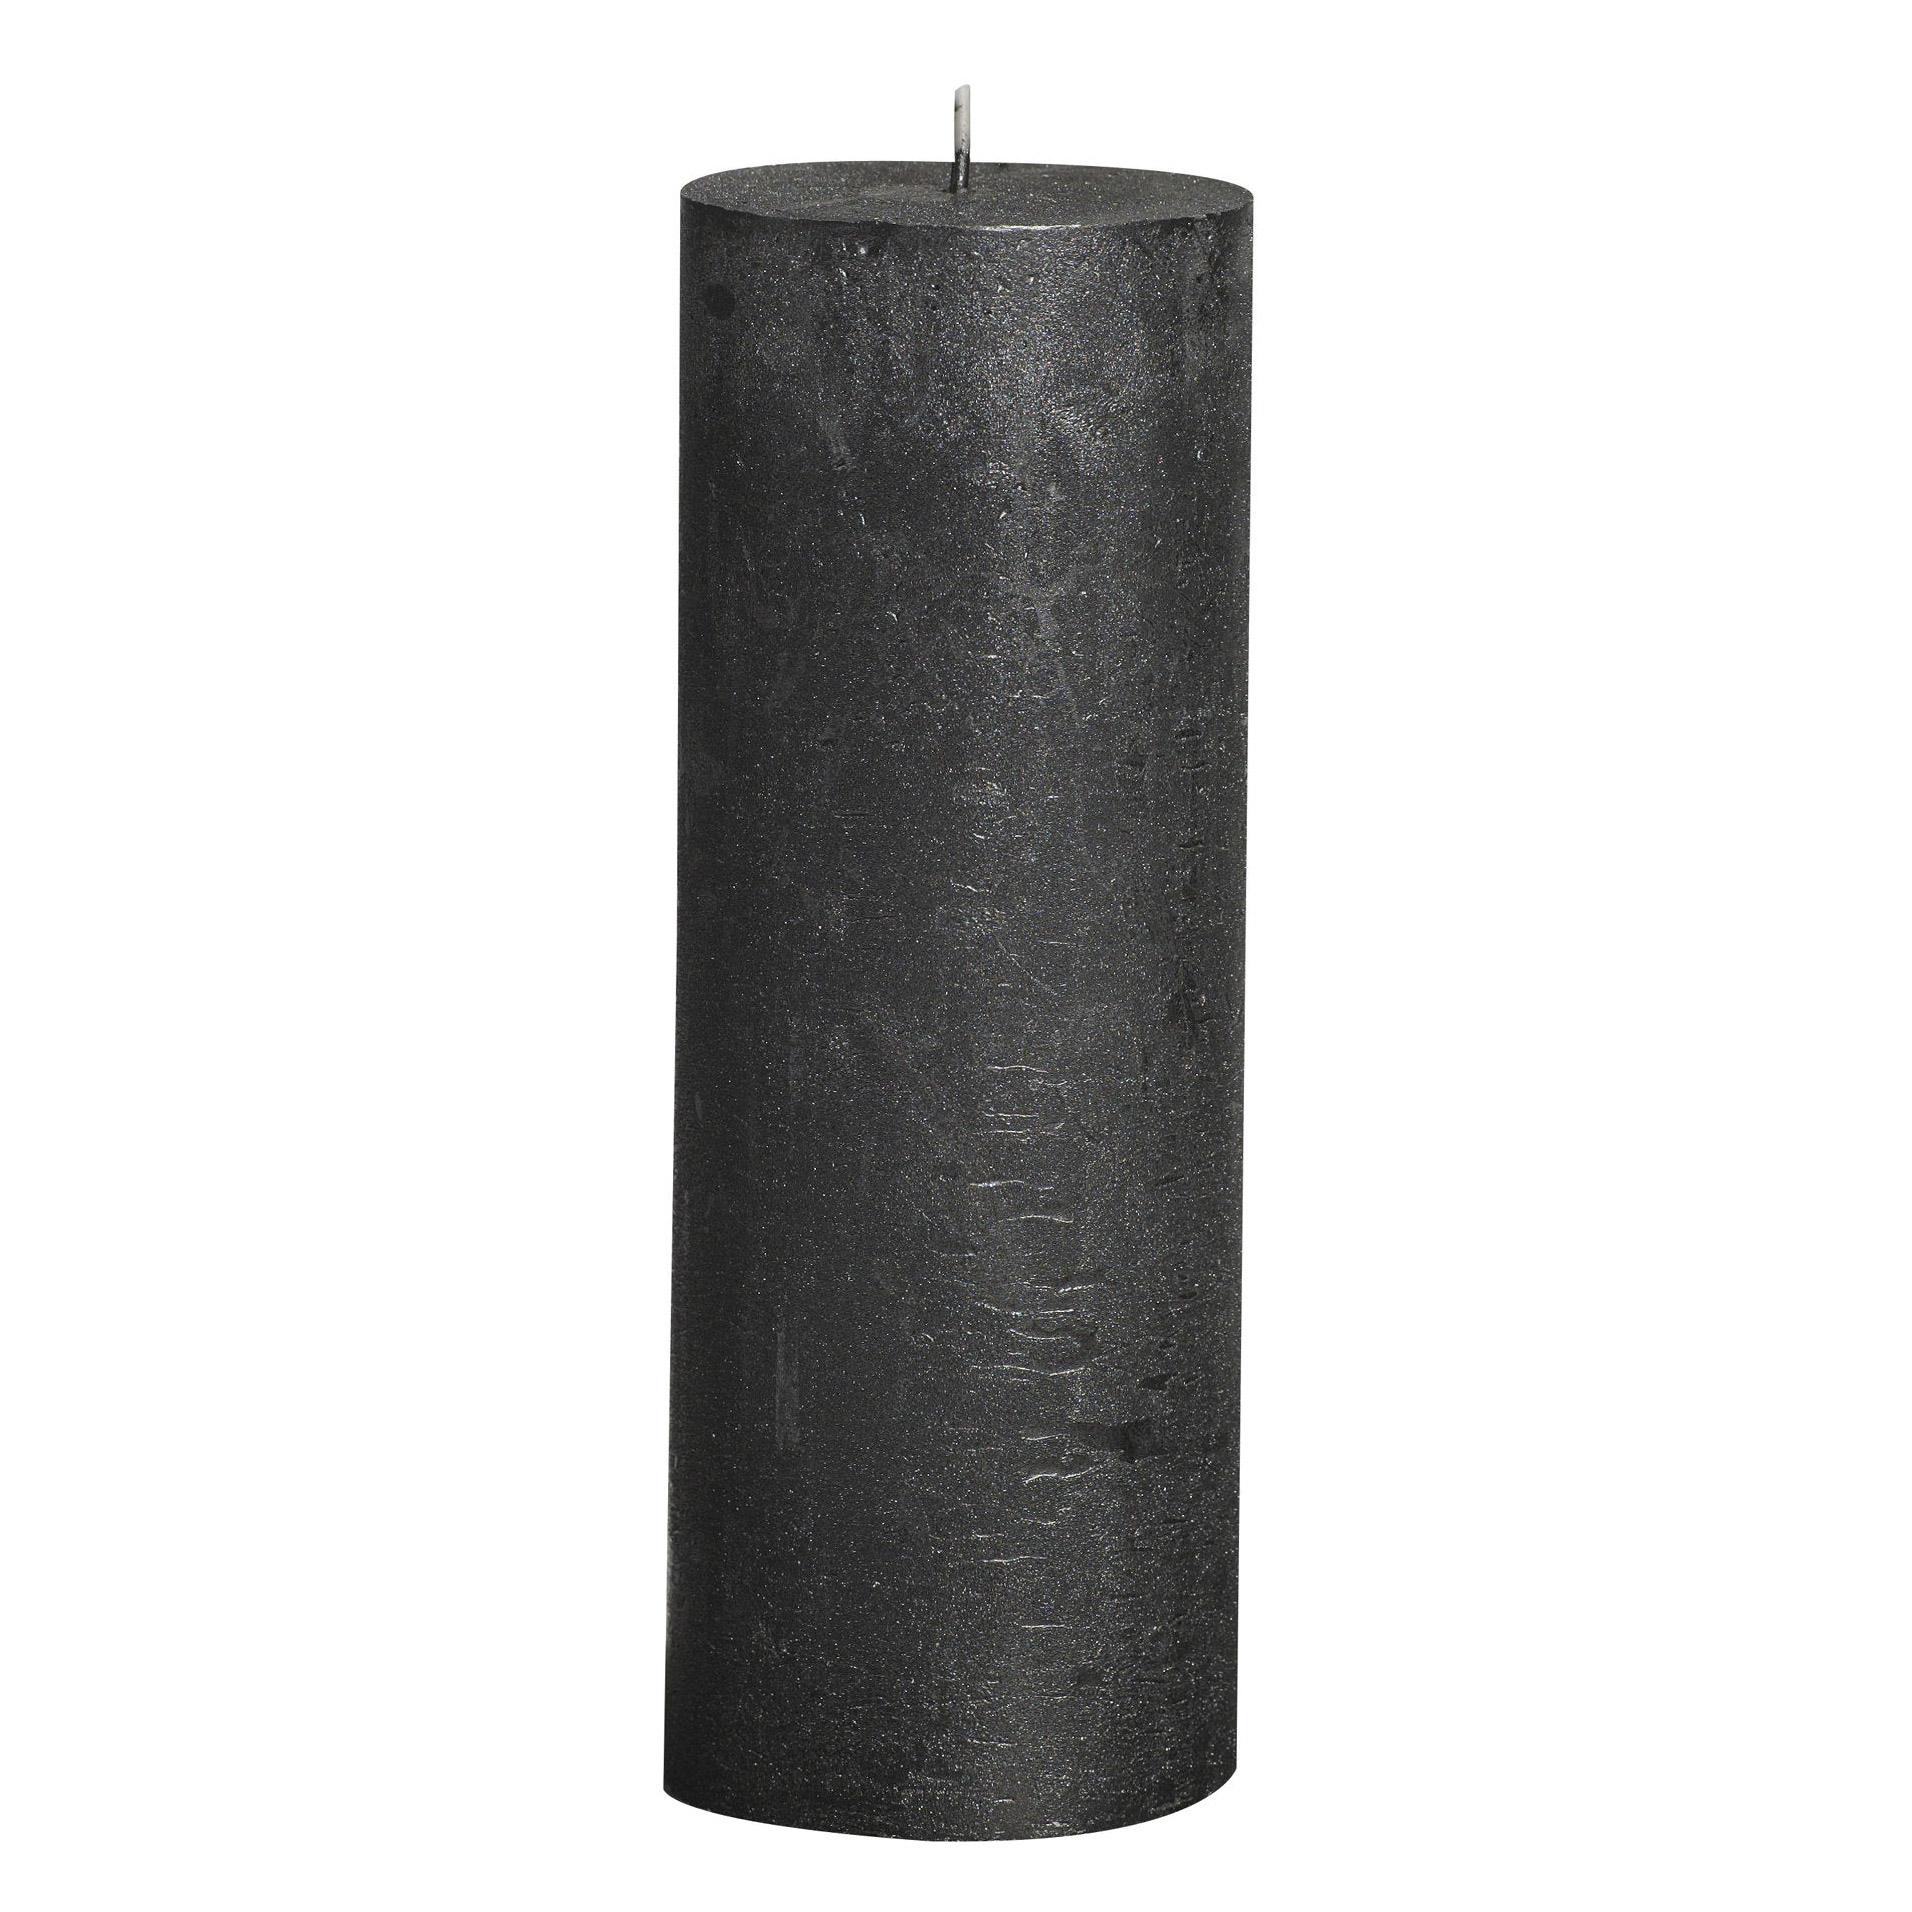 Фото - Свеча Bolsius block Rustic Metallic 19x6,8 см антрацит свеча bolsius rustic metal gold 8х6 8 см